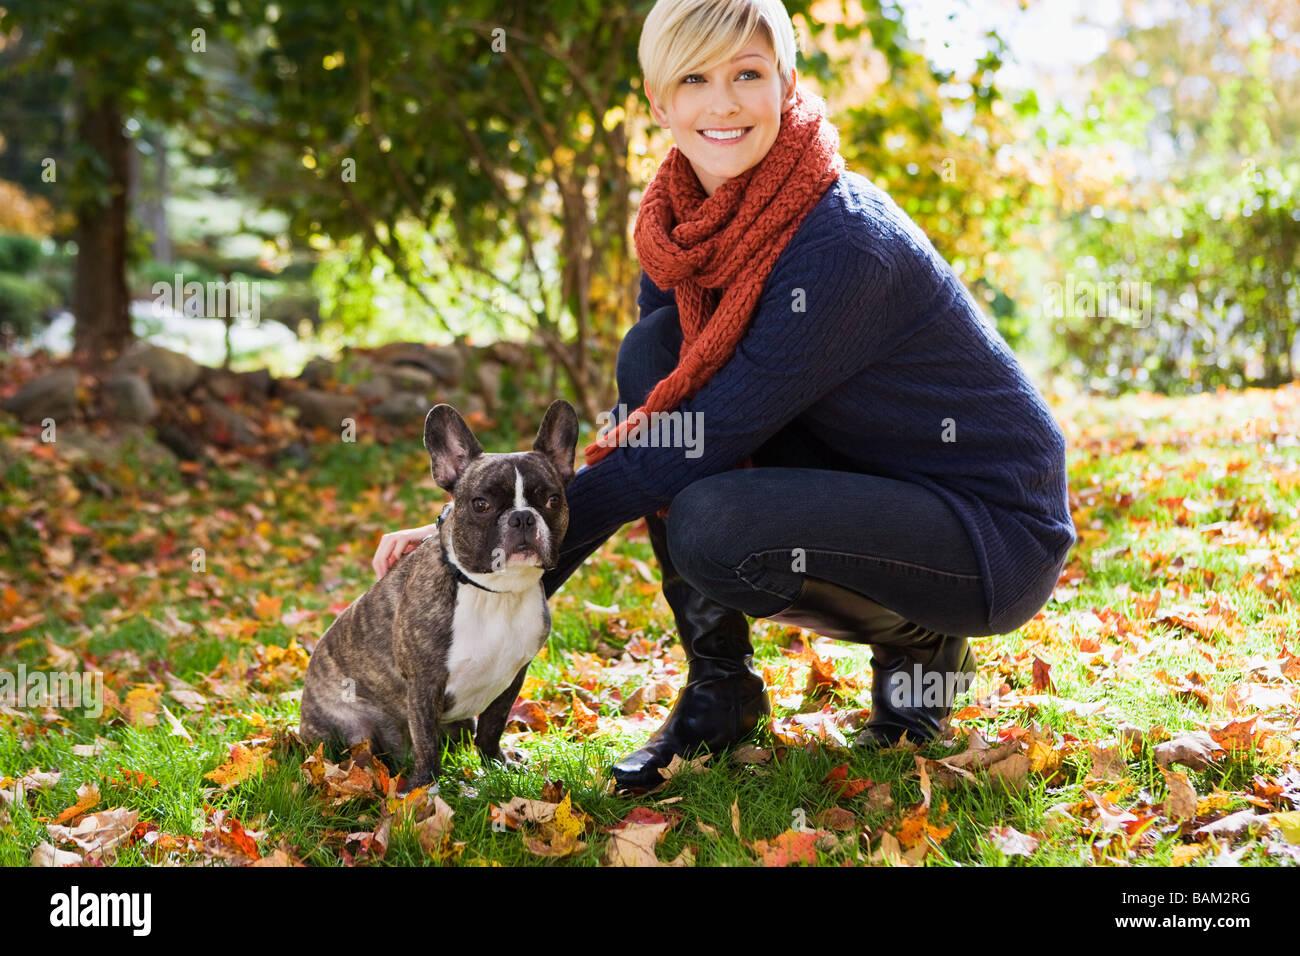 Junge Frau mit Hund Stockbild